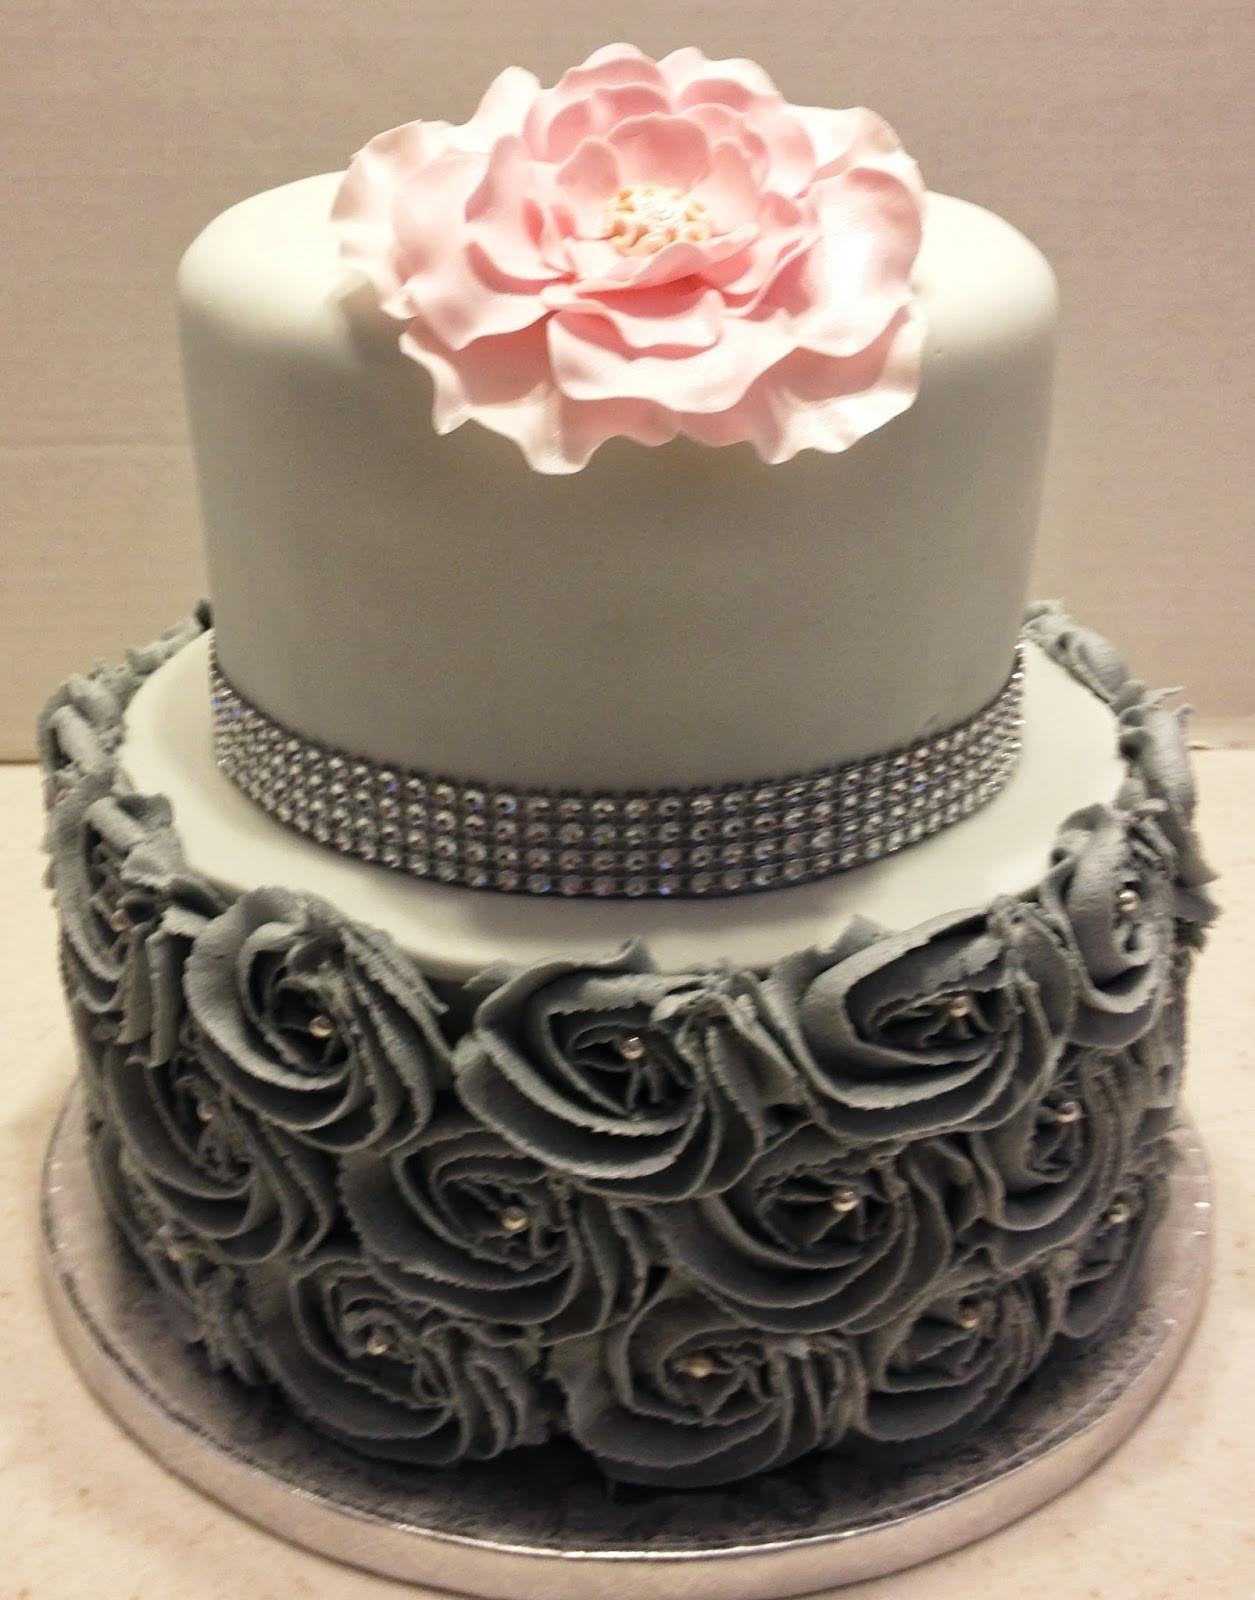 60th Birthday Cake Ideas  MaryMel Cakes 60th Birthday